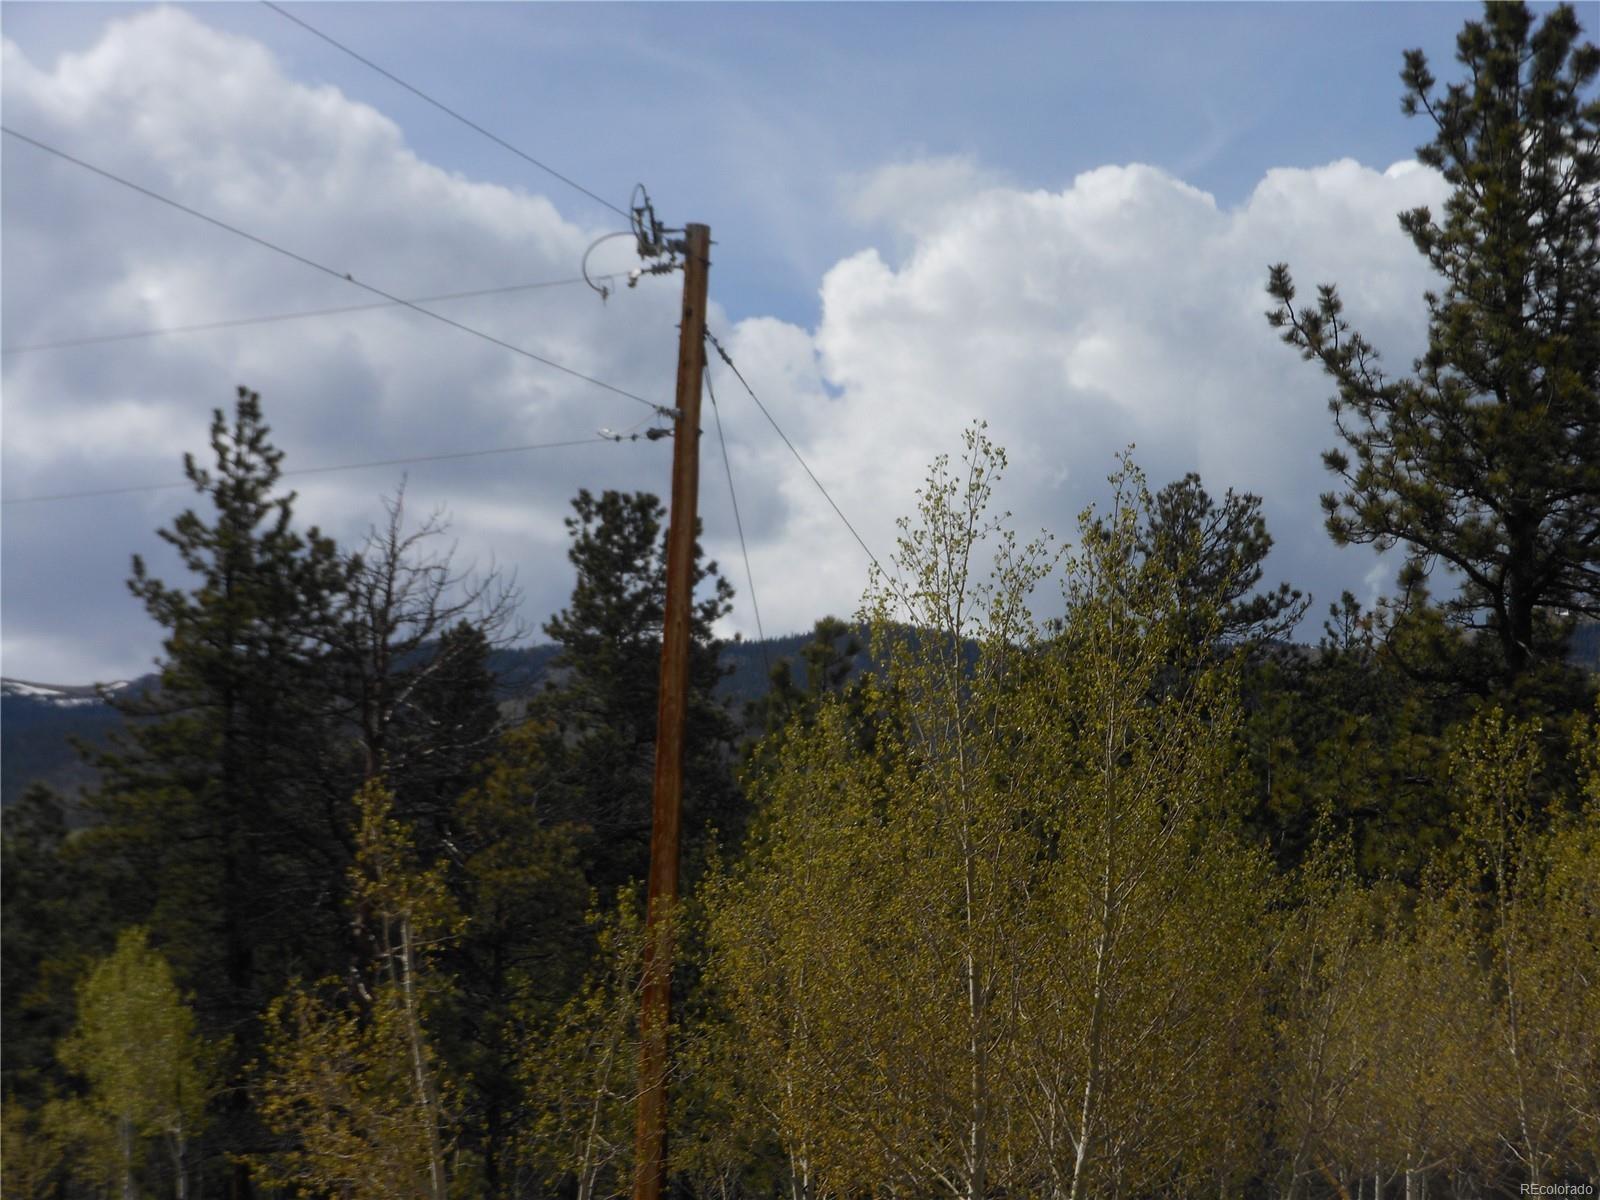 MLS# 1854490 - 3 - 23 Sunset Drive, Bailey, CO 80421